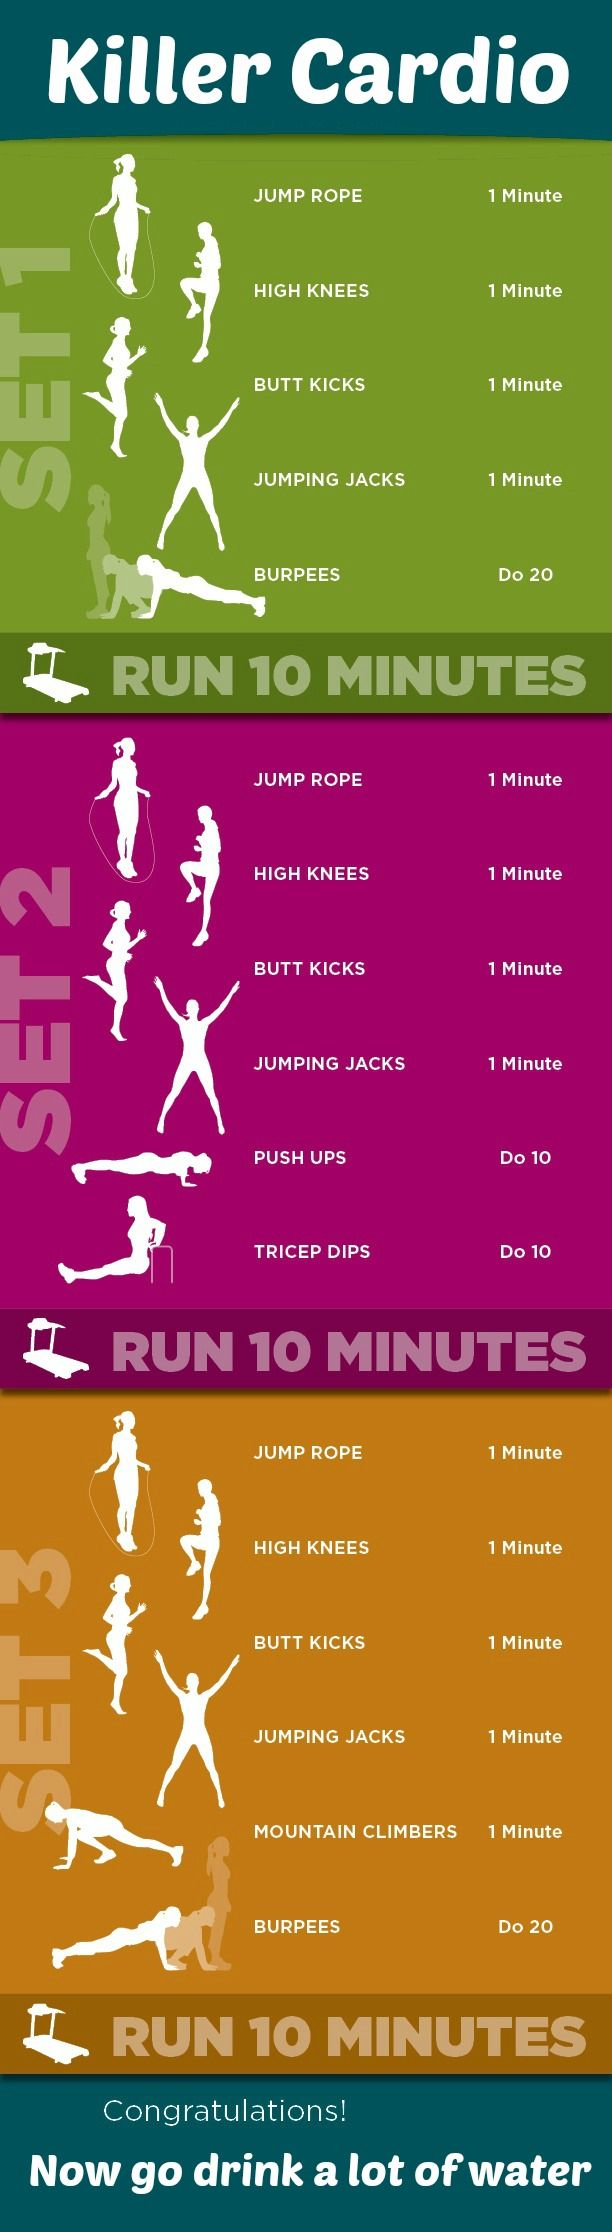 Celebrate #ToneItUpTuesday with this Killer Cardio workout! #PrettyMuddy